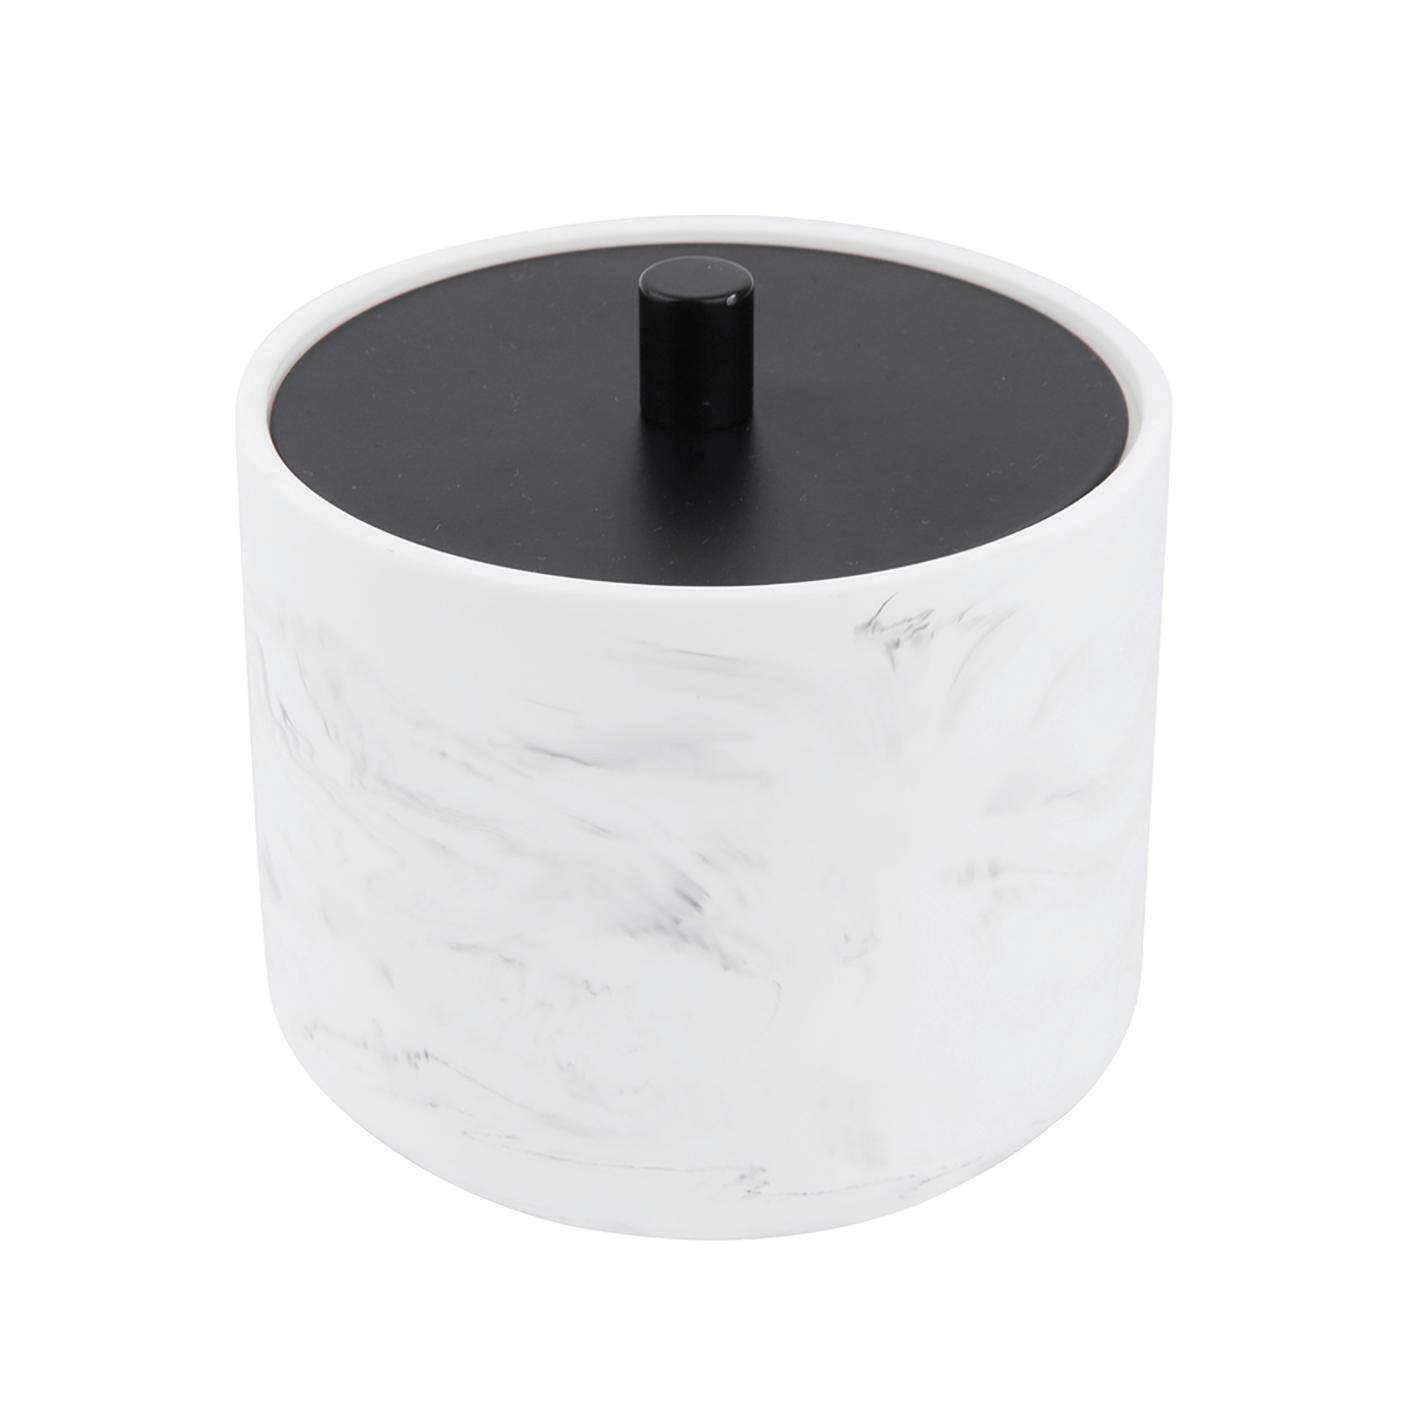 Porta cotone Cloud in poliresina bianco SENSEA - 1